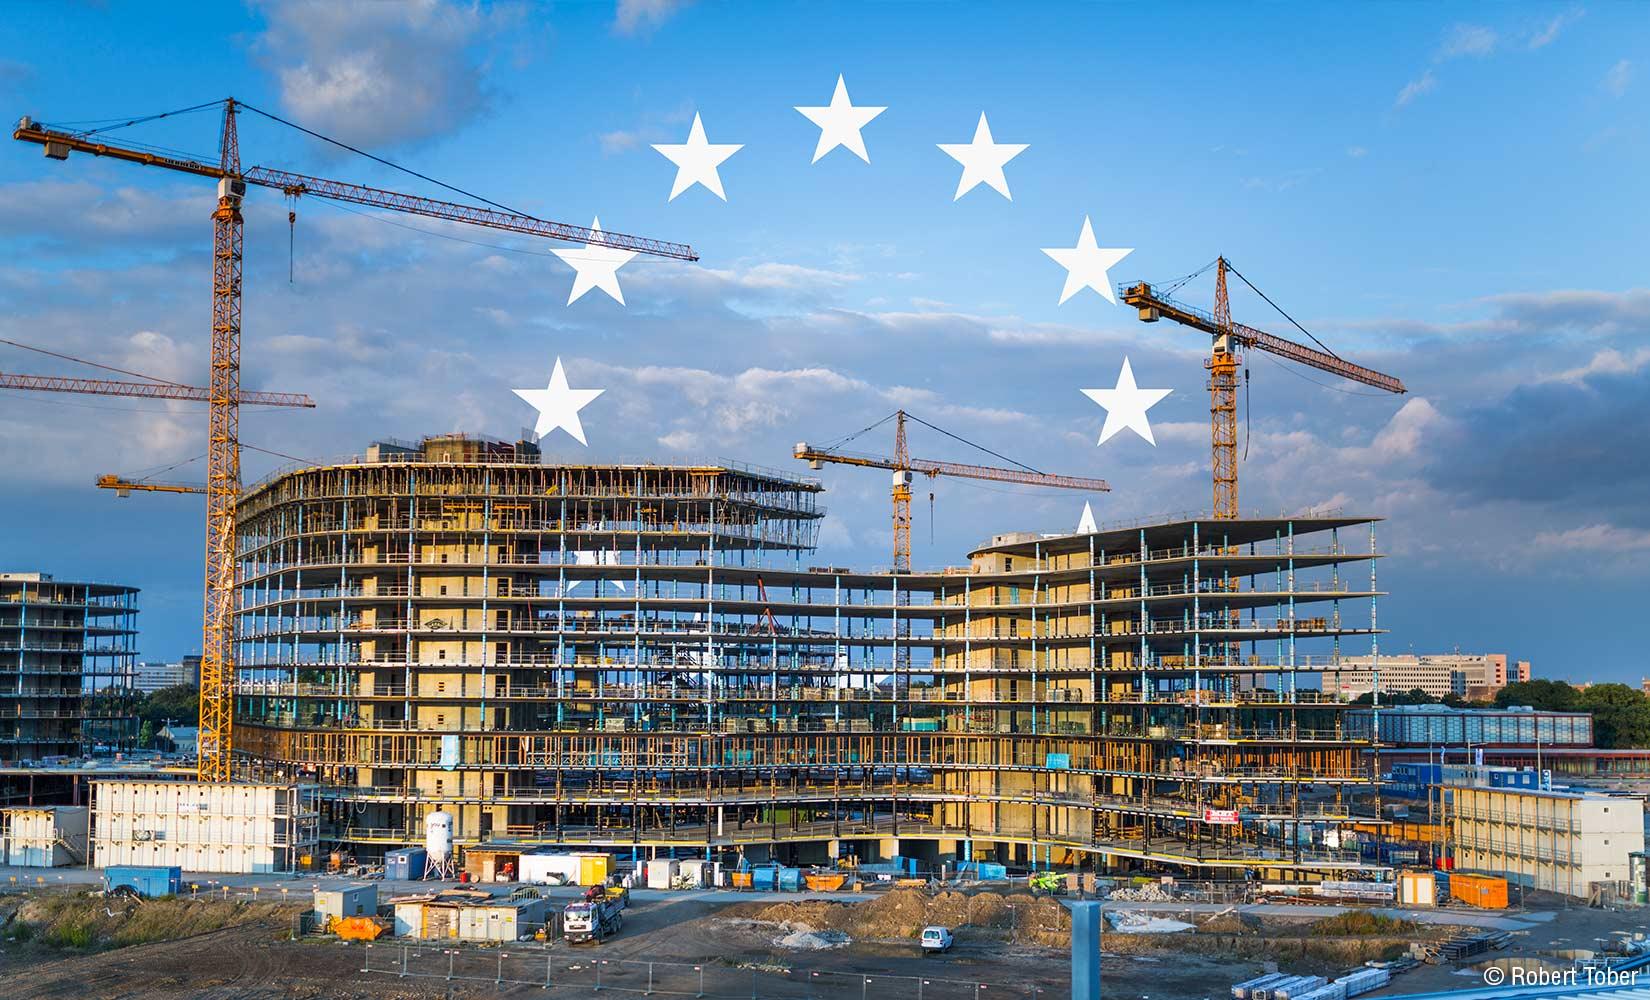 Hauptbahnhof Wien, Baustelle mit Kränen © Robert Tober